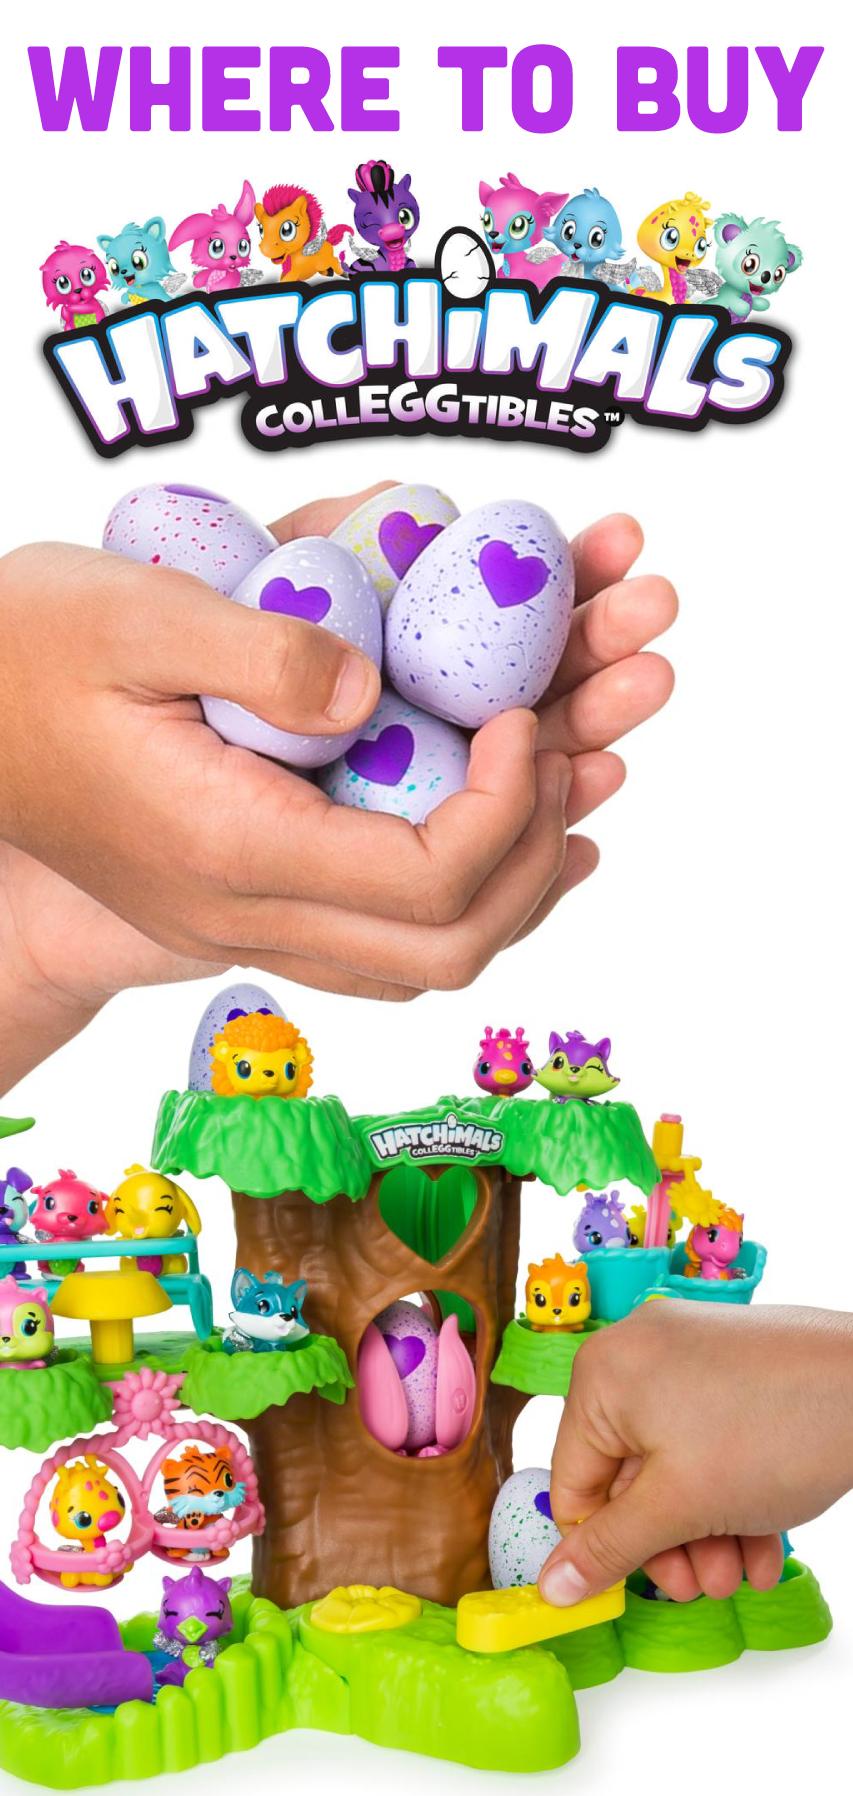 Where To Buy Hatchimals Colleggtibles The Hatchery Nursery